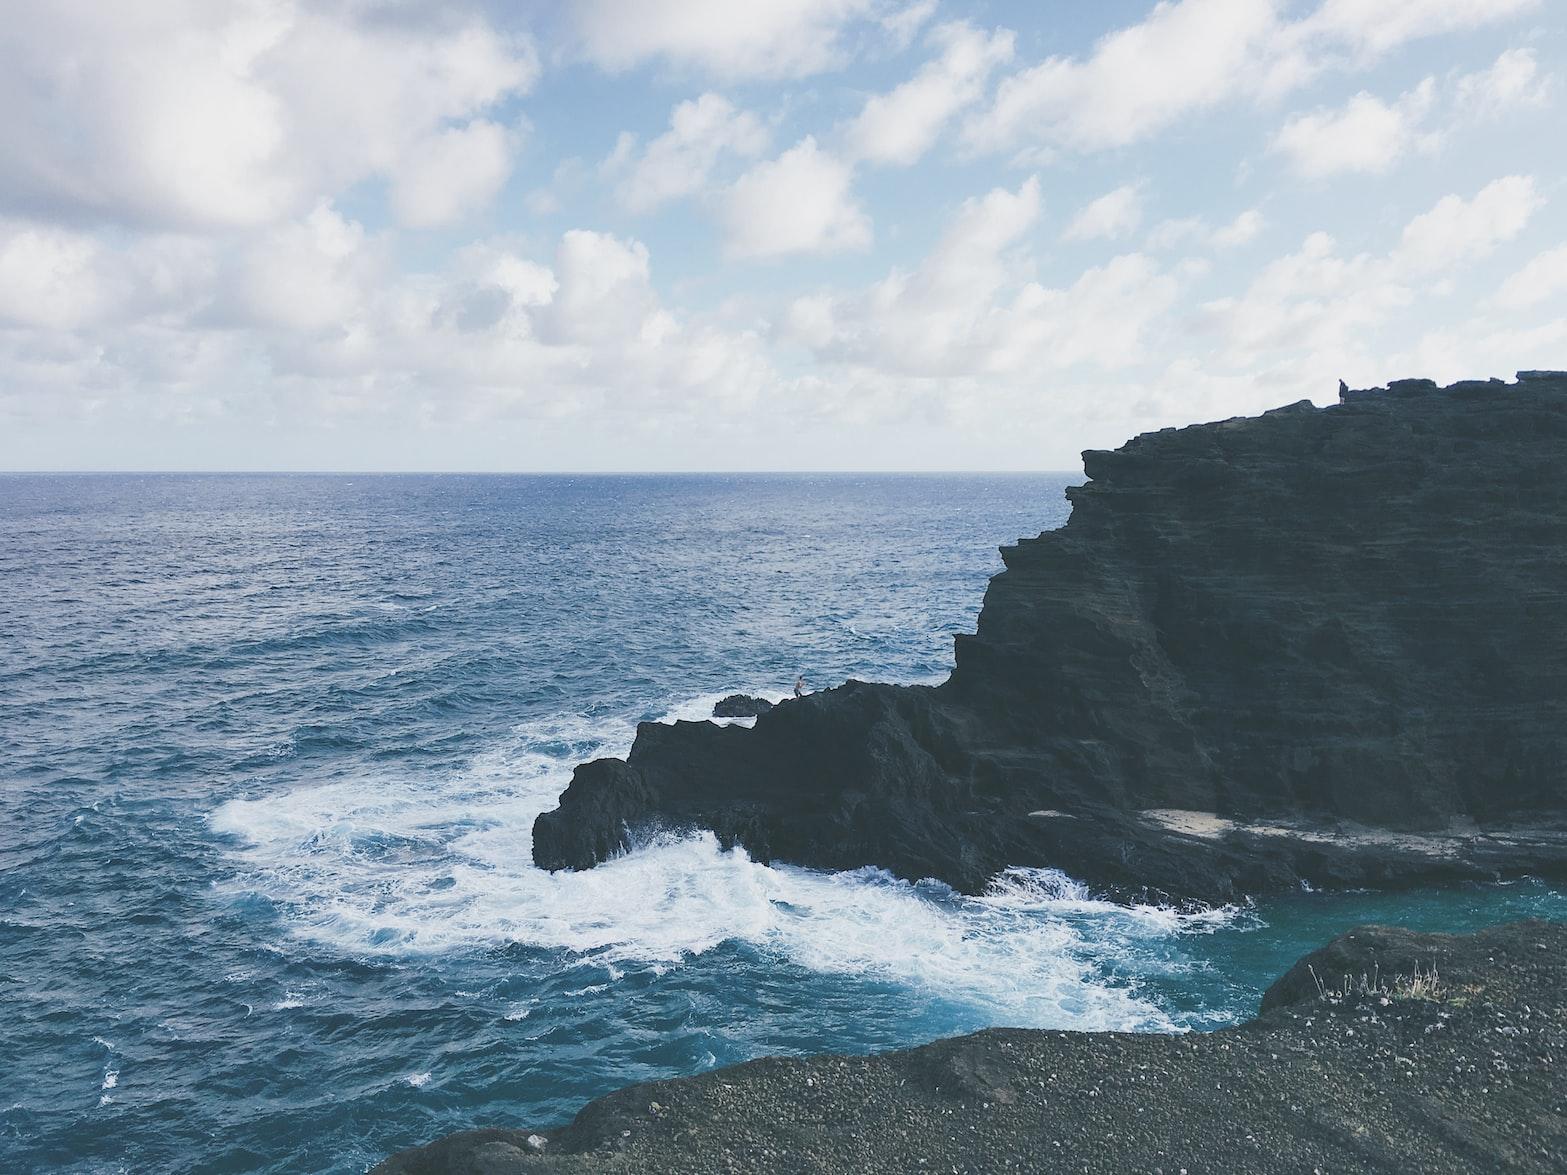 waves crashing against rocks on Rhode Island coastline